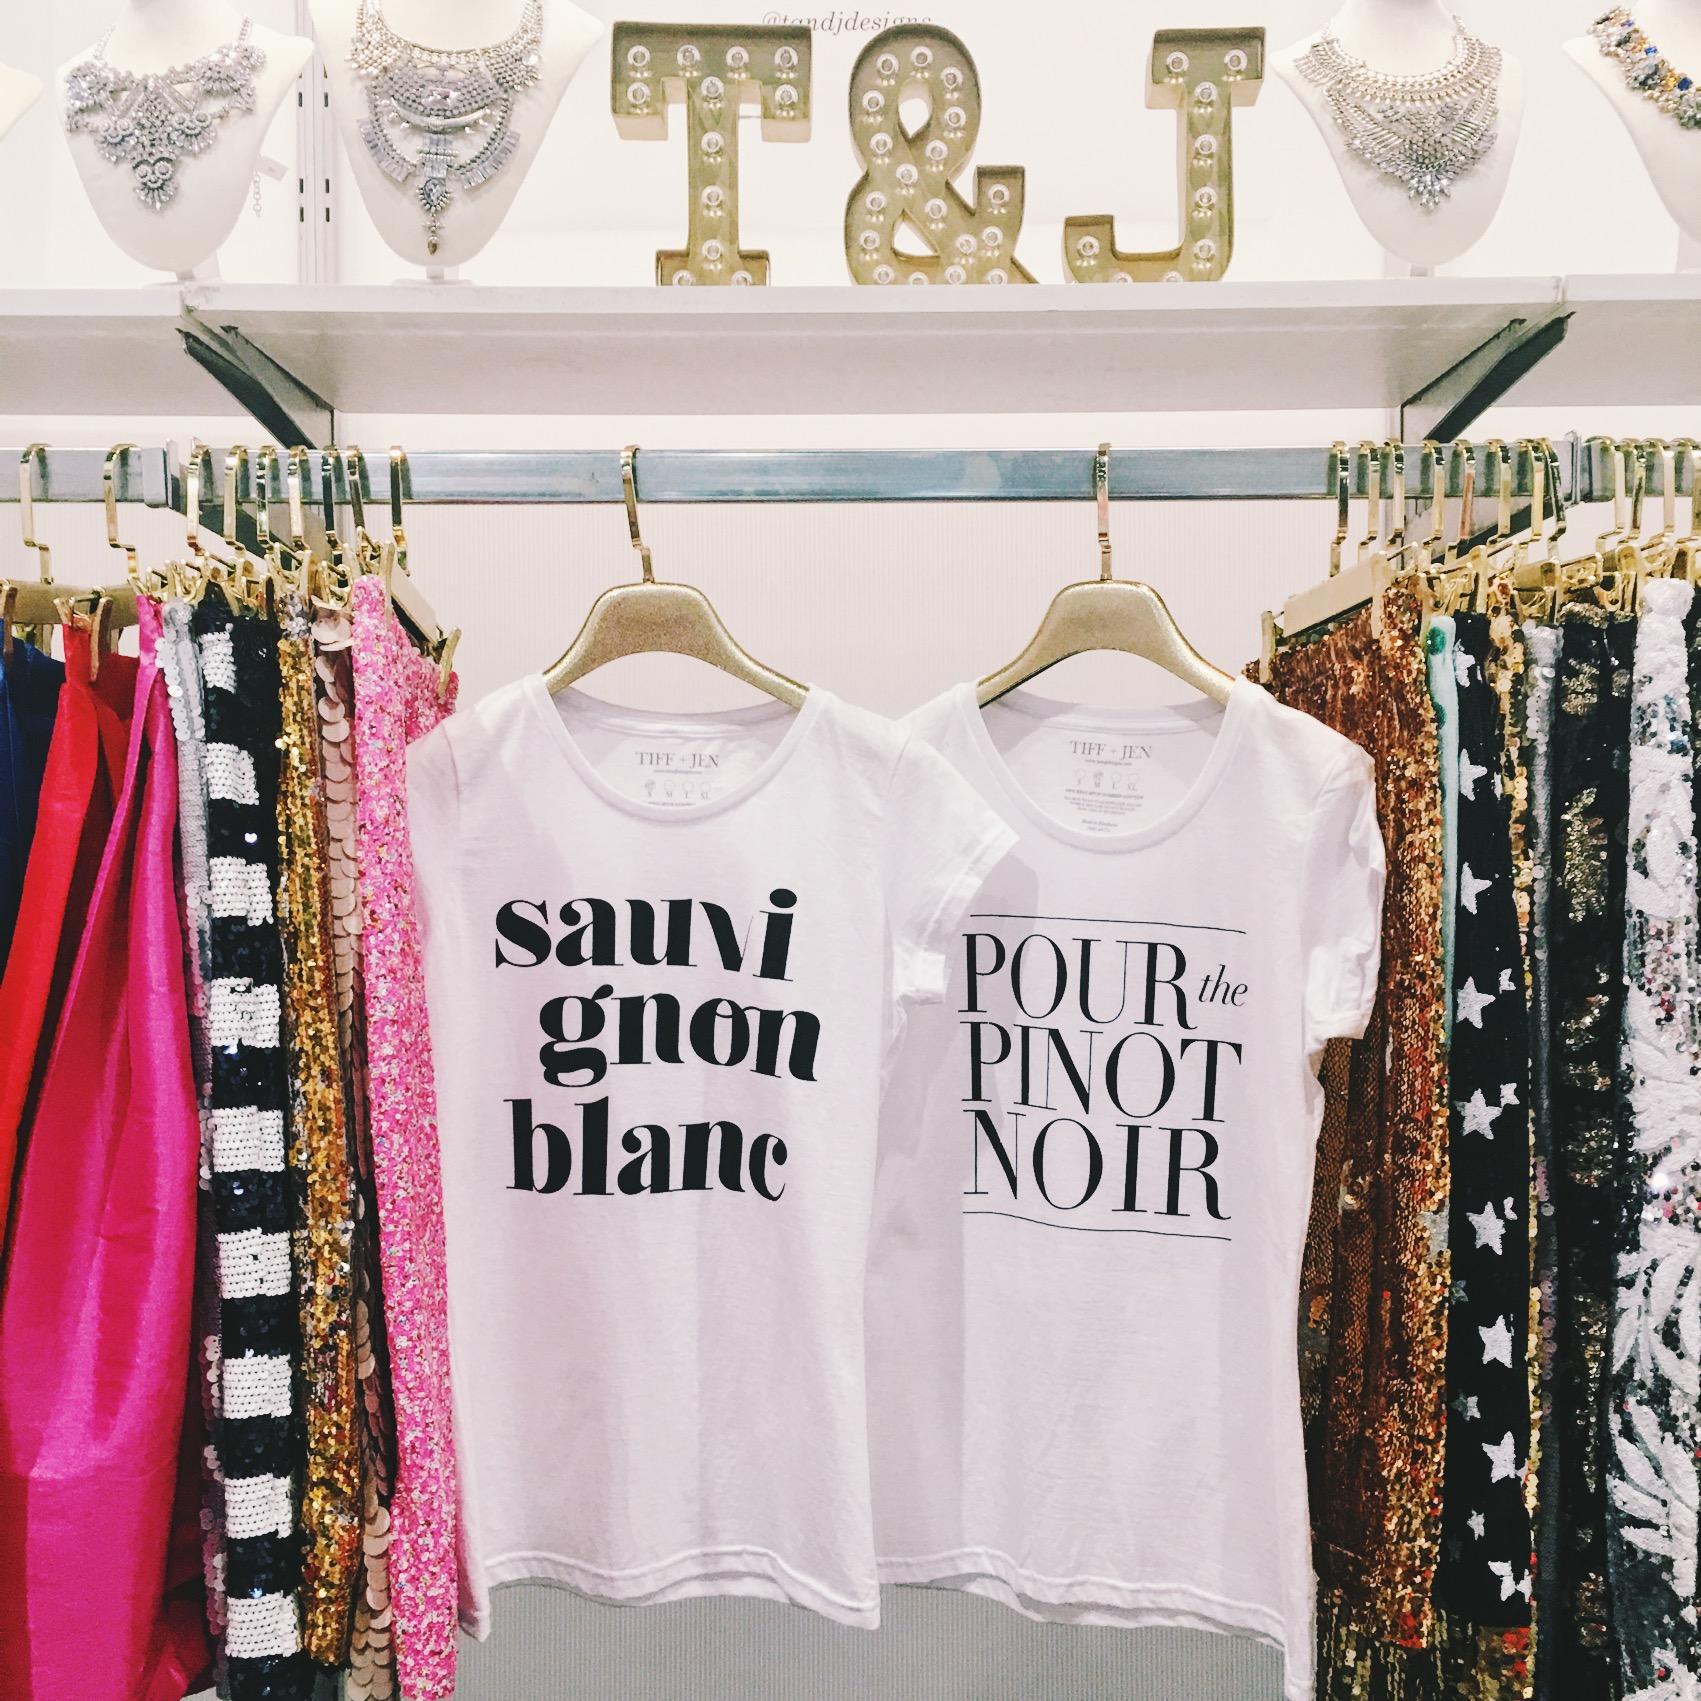 tiff and jen, T&J Designs, closing a chapter, entrepreneur tips, closing a business, women entrepreneurs